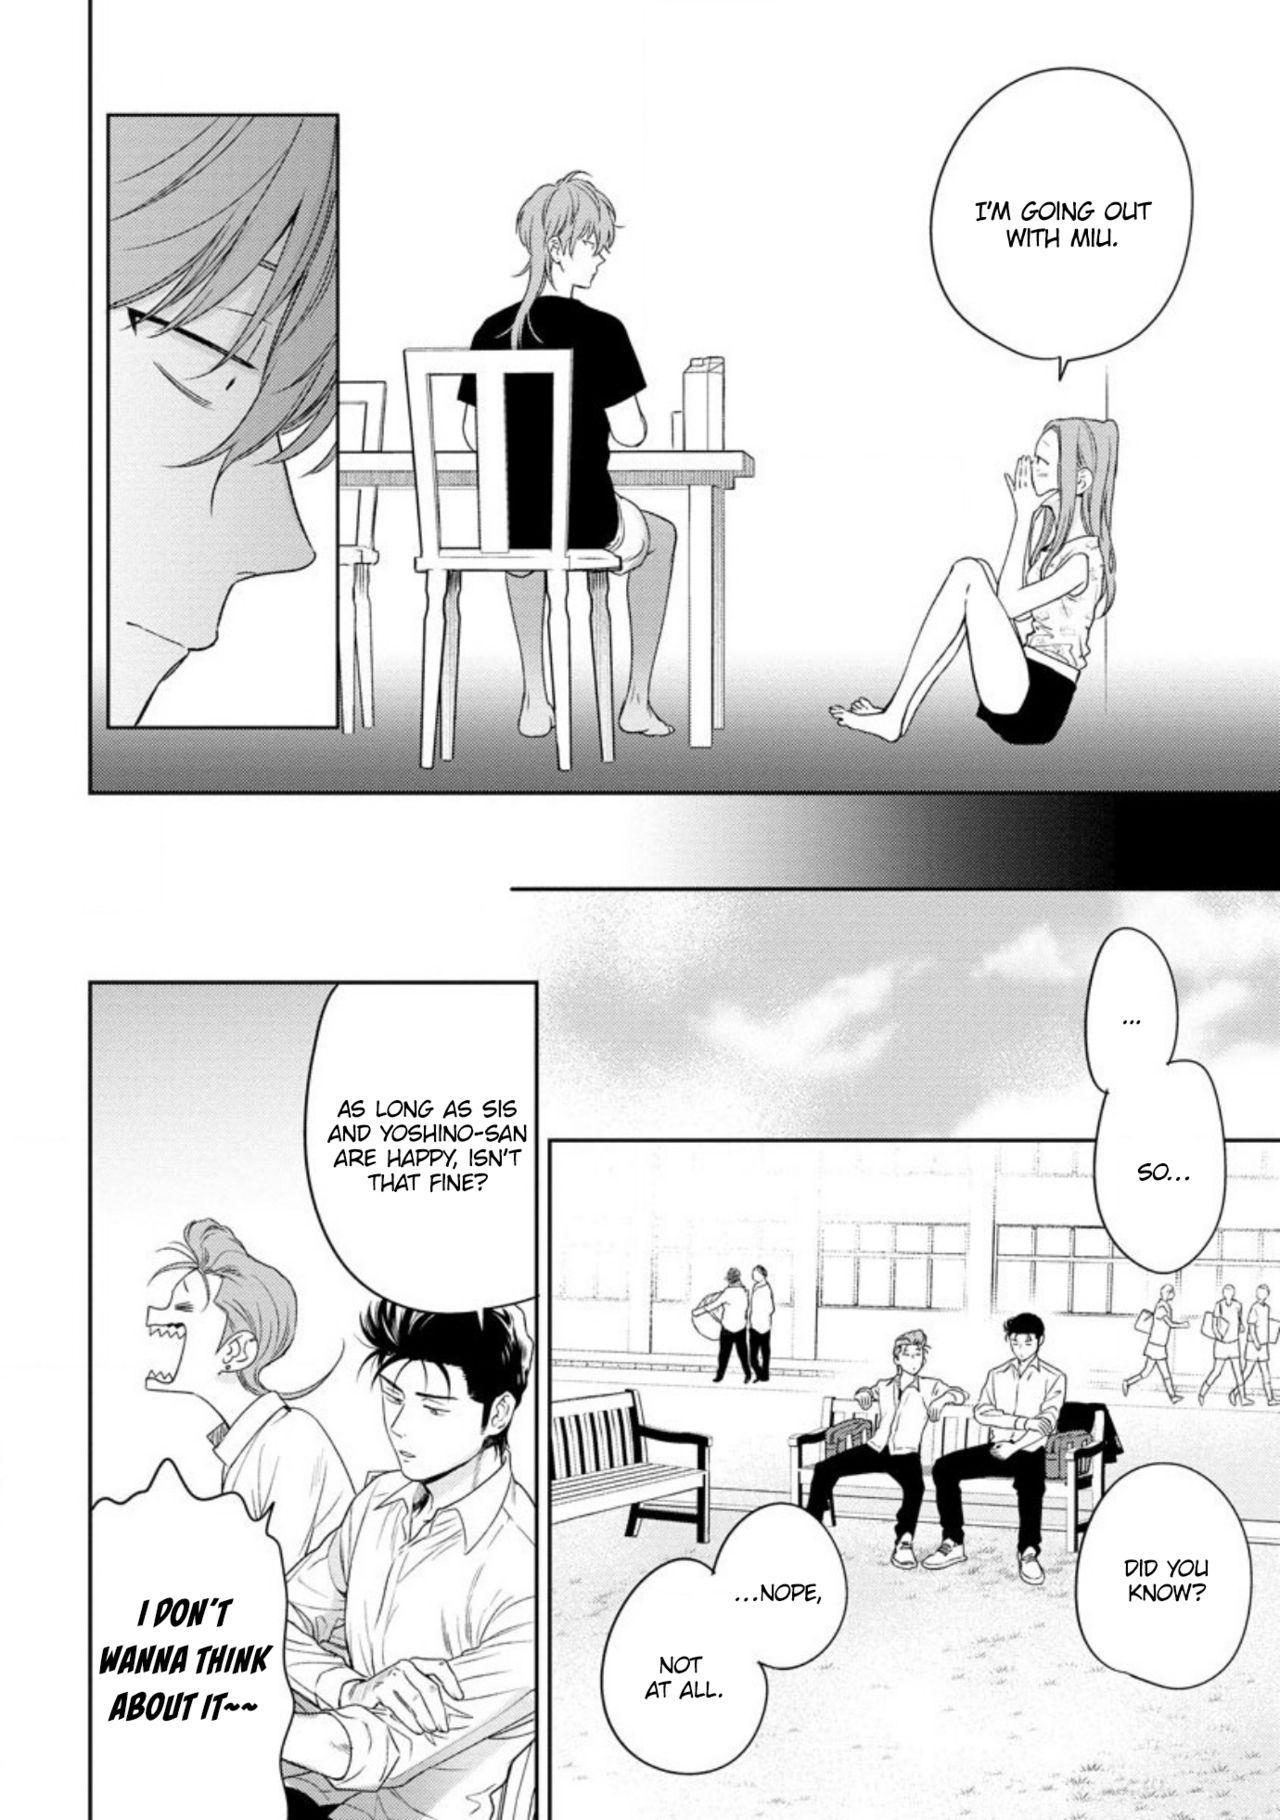 [Hiiragi Nozomu] Nakasete Yaru yo Yankee-kun   I'll Make You Cry Ch. 1-5 + Extras [English] [Digital] 186